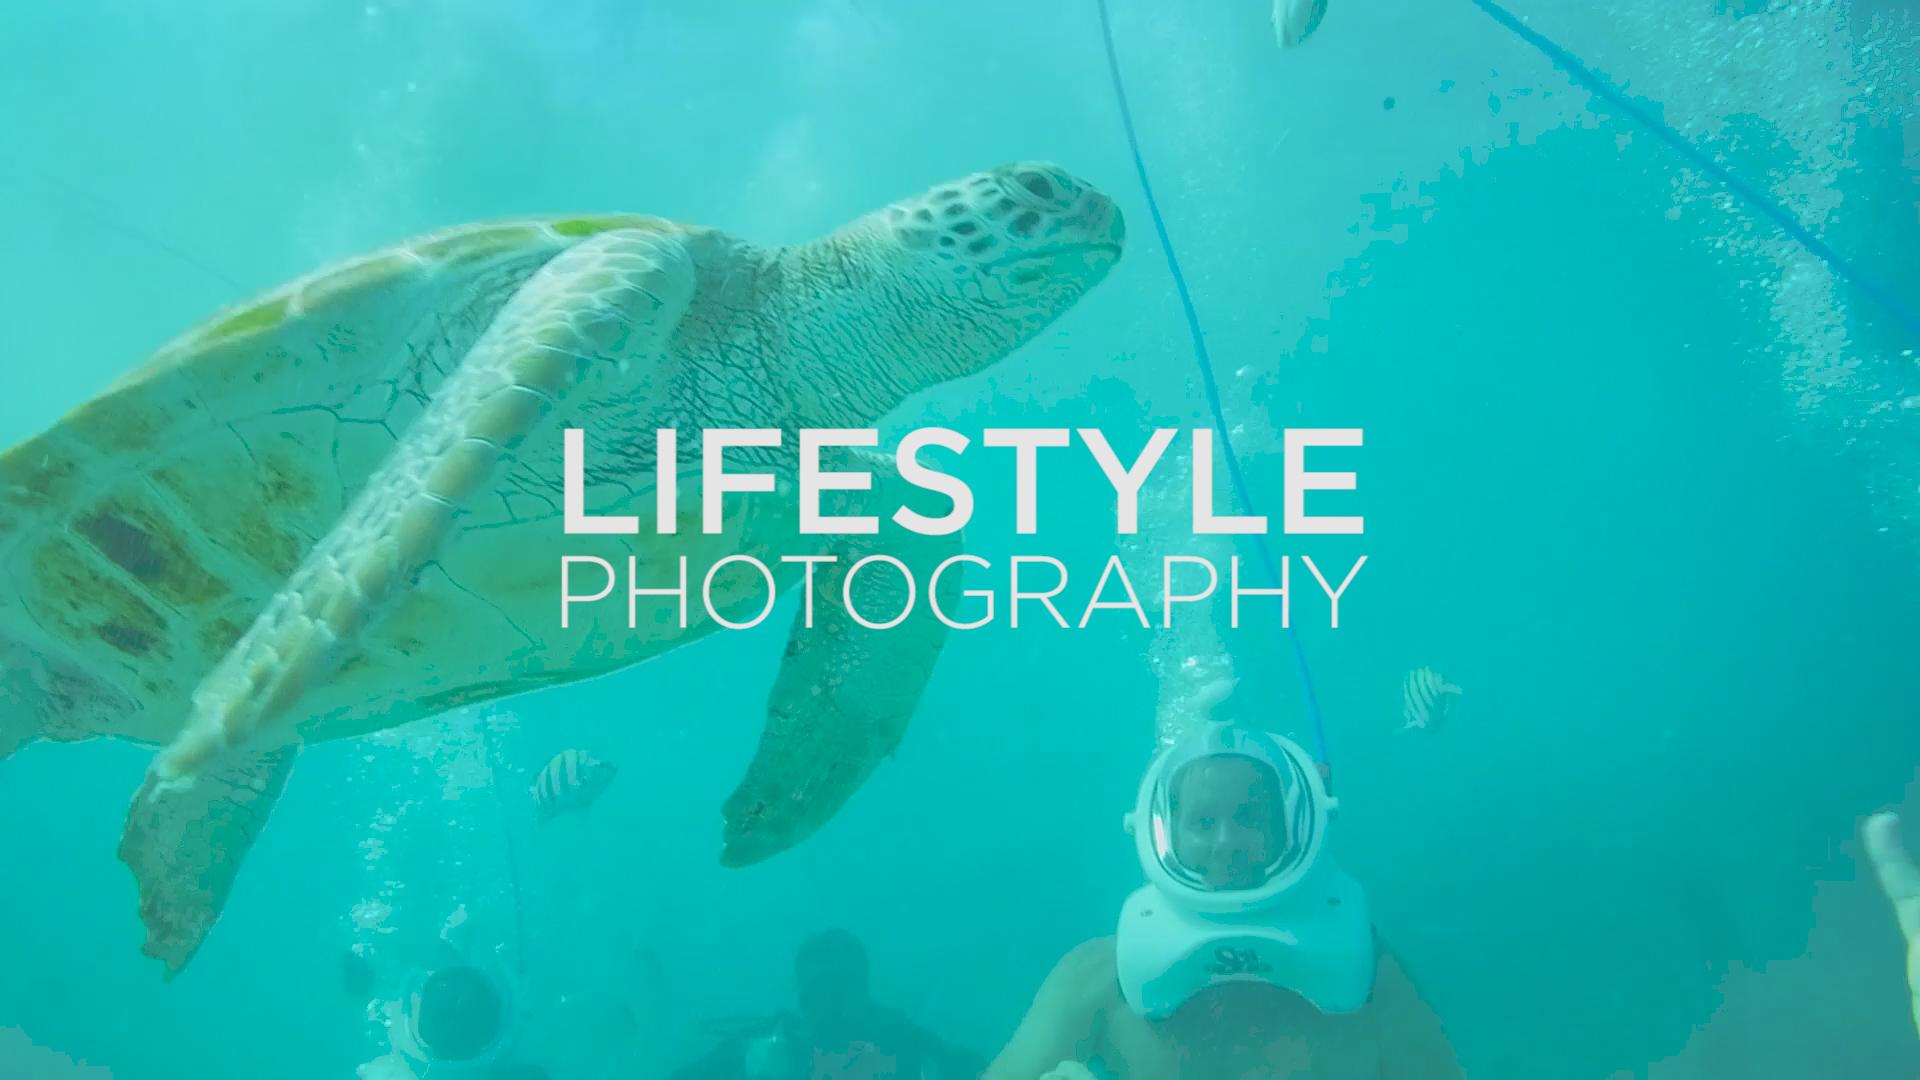 SEBUintl-CANCUN_2015-P3P-LIFESTYLE_PHOTOGRAPHY-SEBU-001.jpg